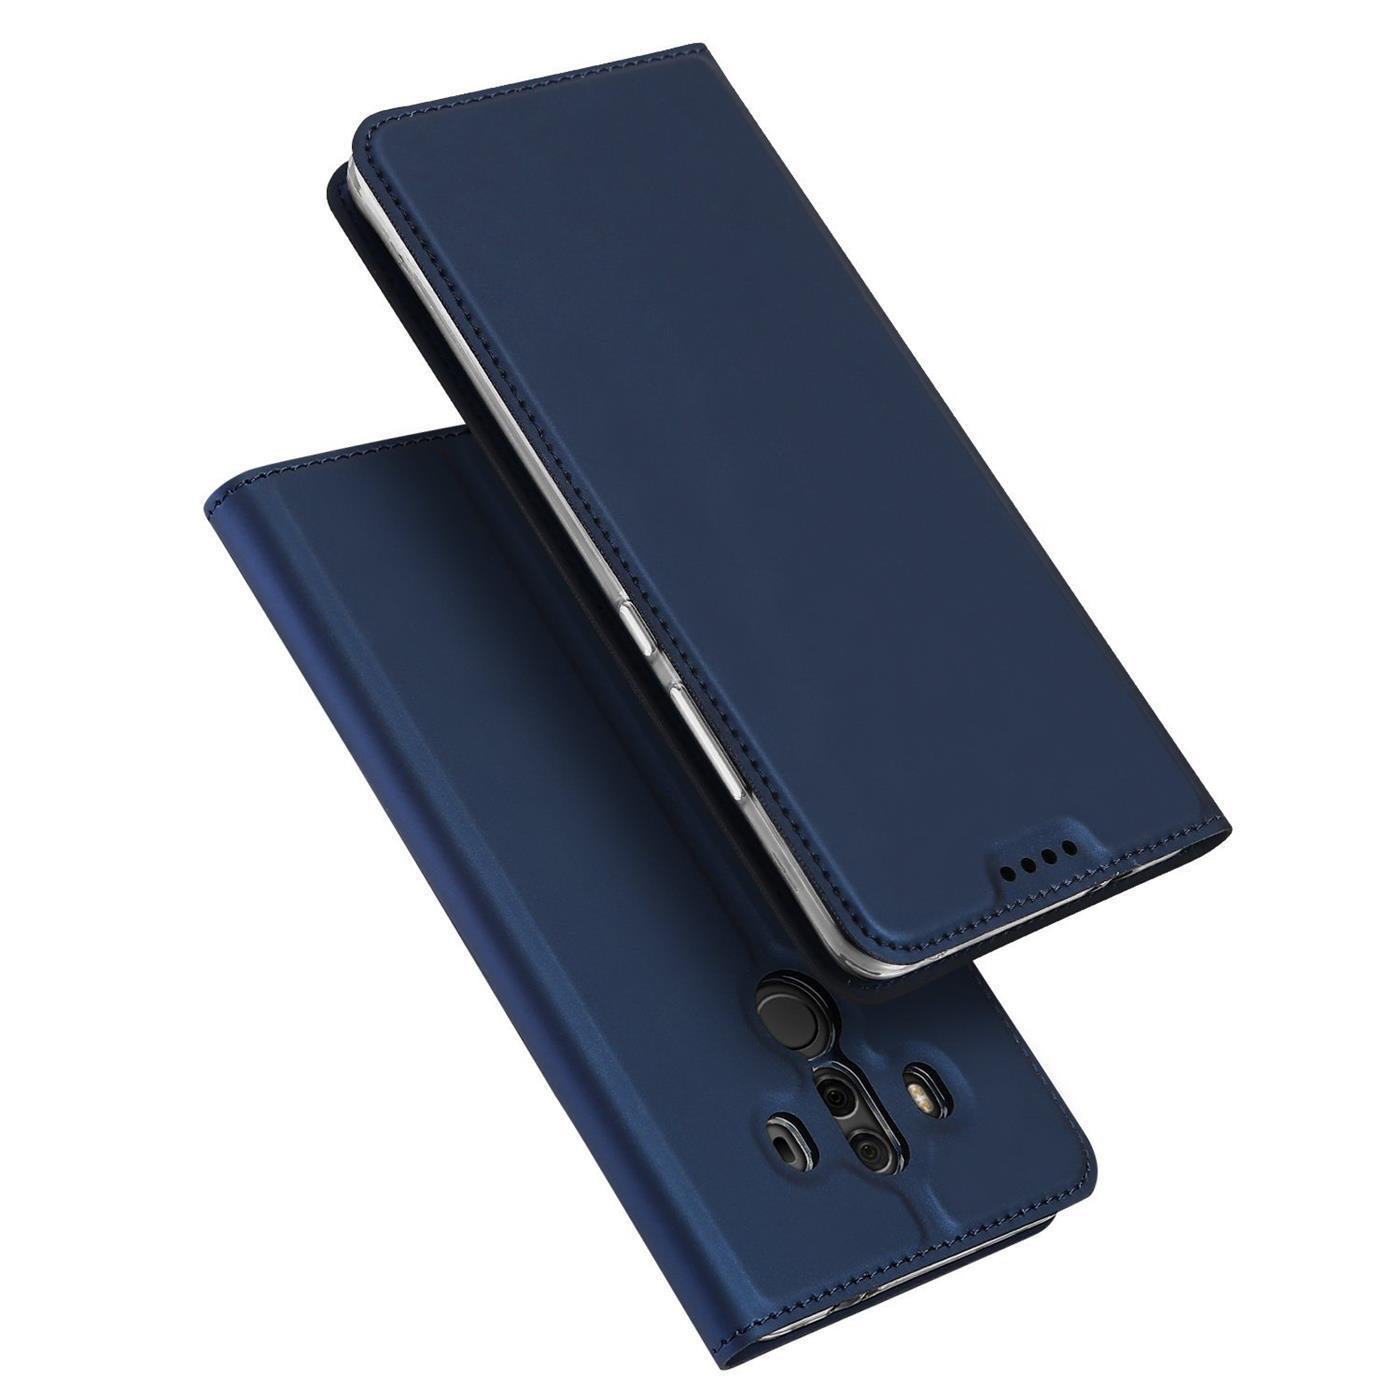 Funda-para-Movil-Huawei-Mate-10-Pro-Libro-Protectora-Slim-Flip-Estuche miniatura 12